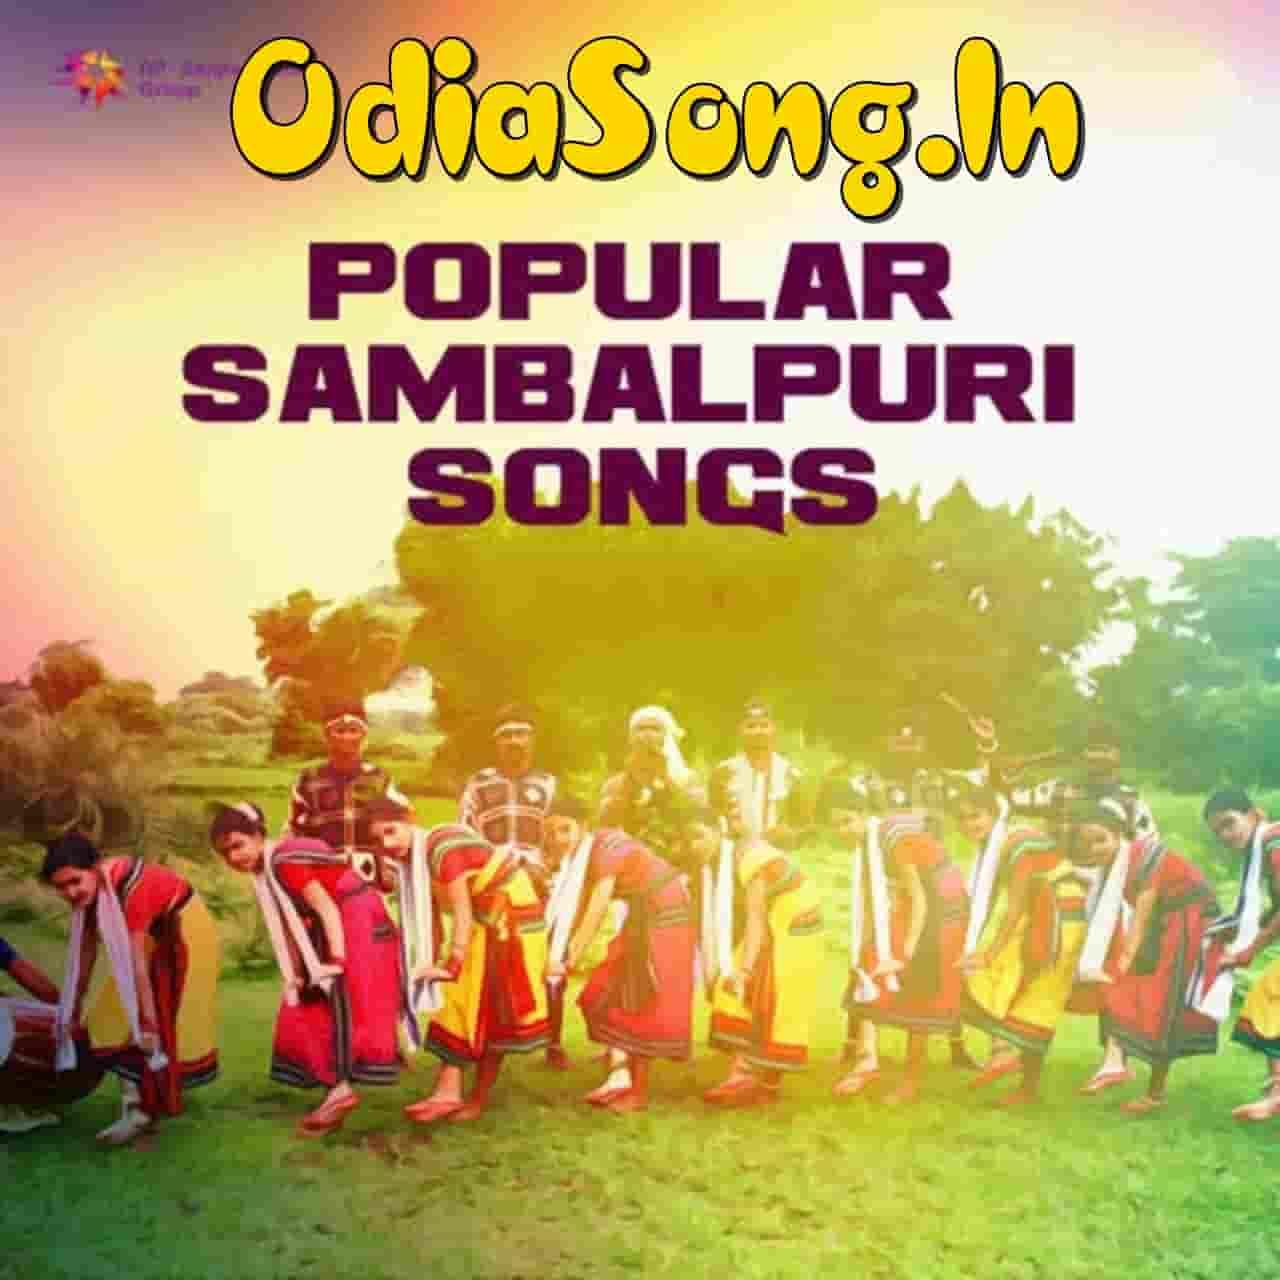 City College Bali Bolbam Version (Bhanu Pratap) New Sambalpuri Song